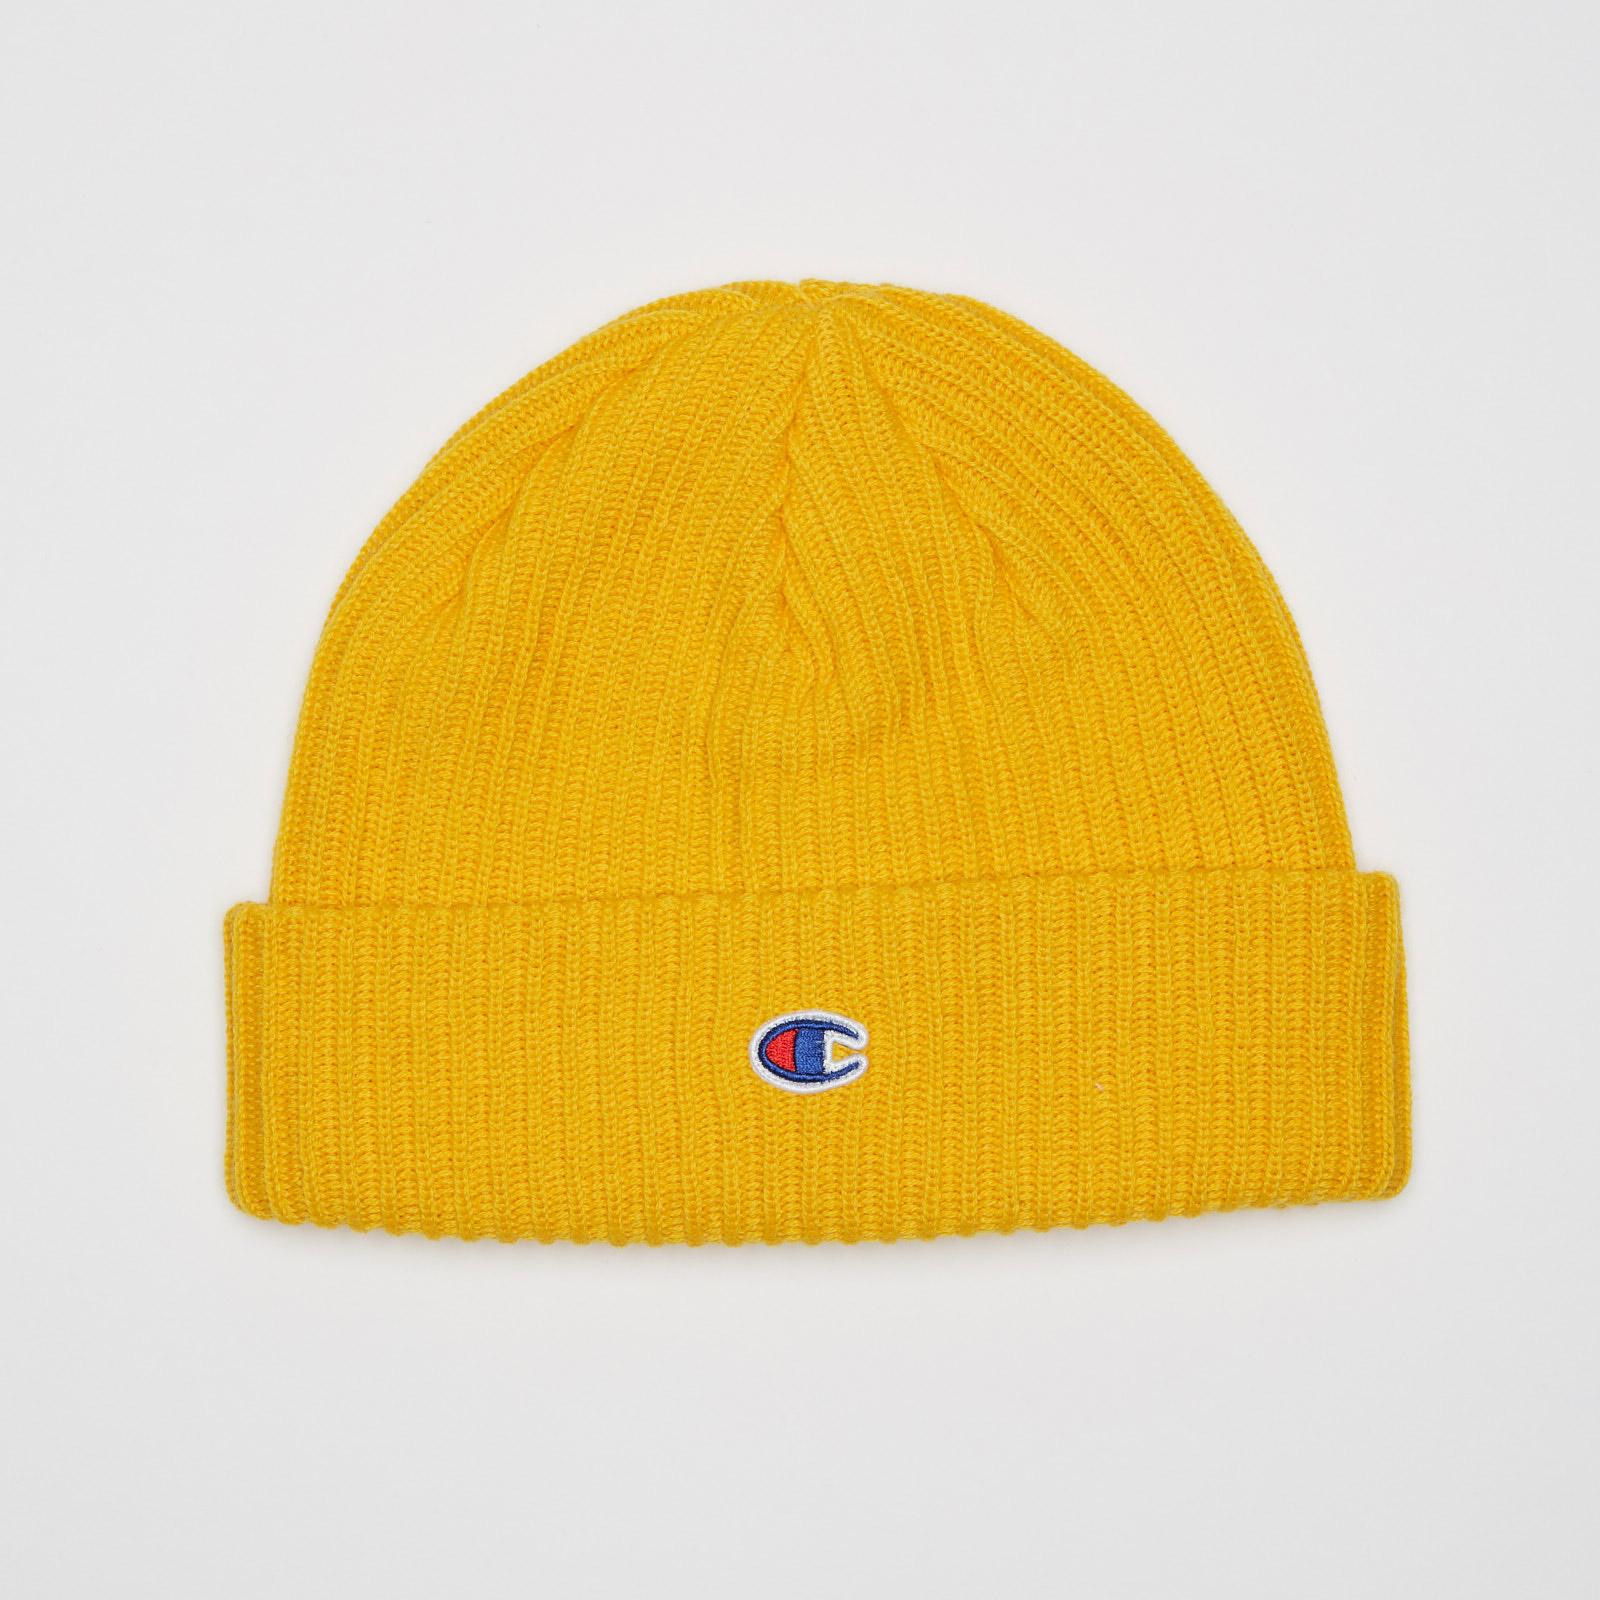 Champion Merino Knit Beanie Logo Hat - 804412-ys026 ... ee9cf4f7cb82